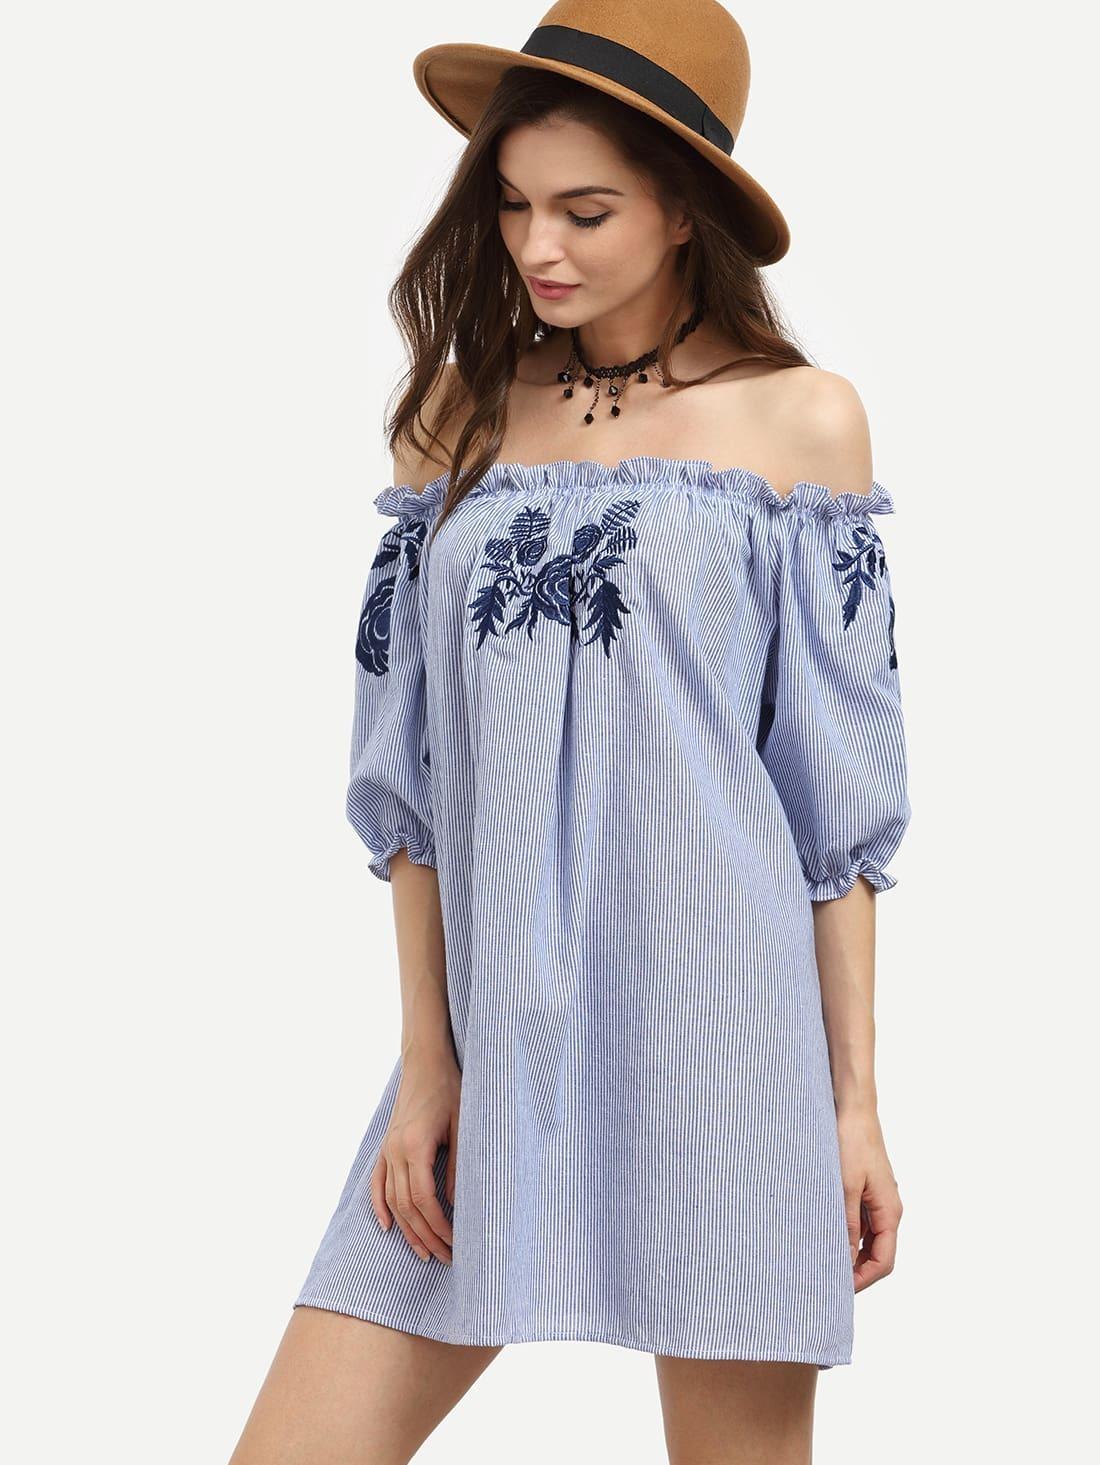 Blue Vertical Striped Embroidered Off The Shoulder Dress -SheIn(Sheinside)